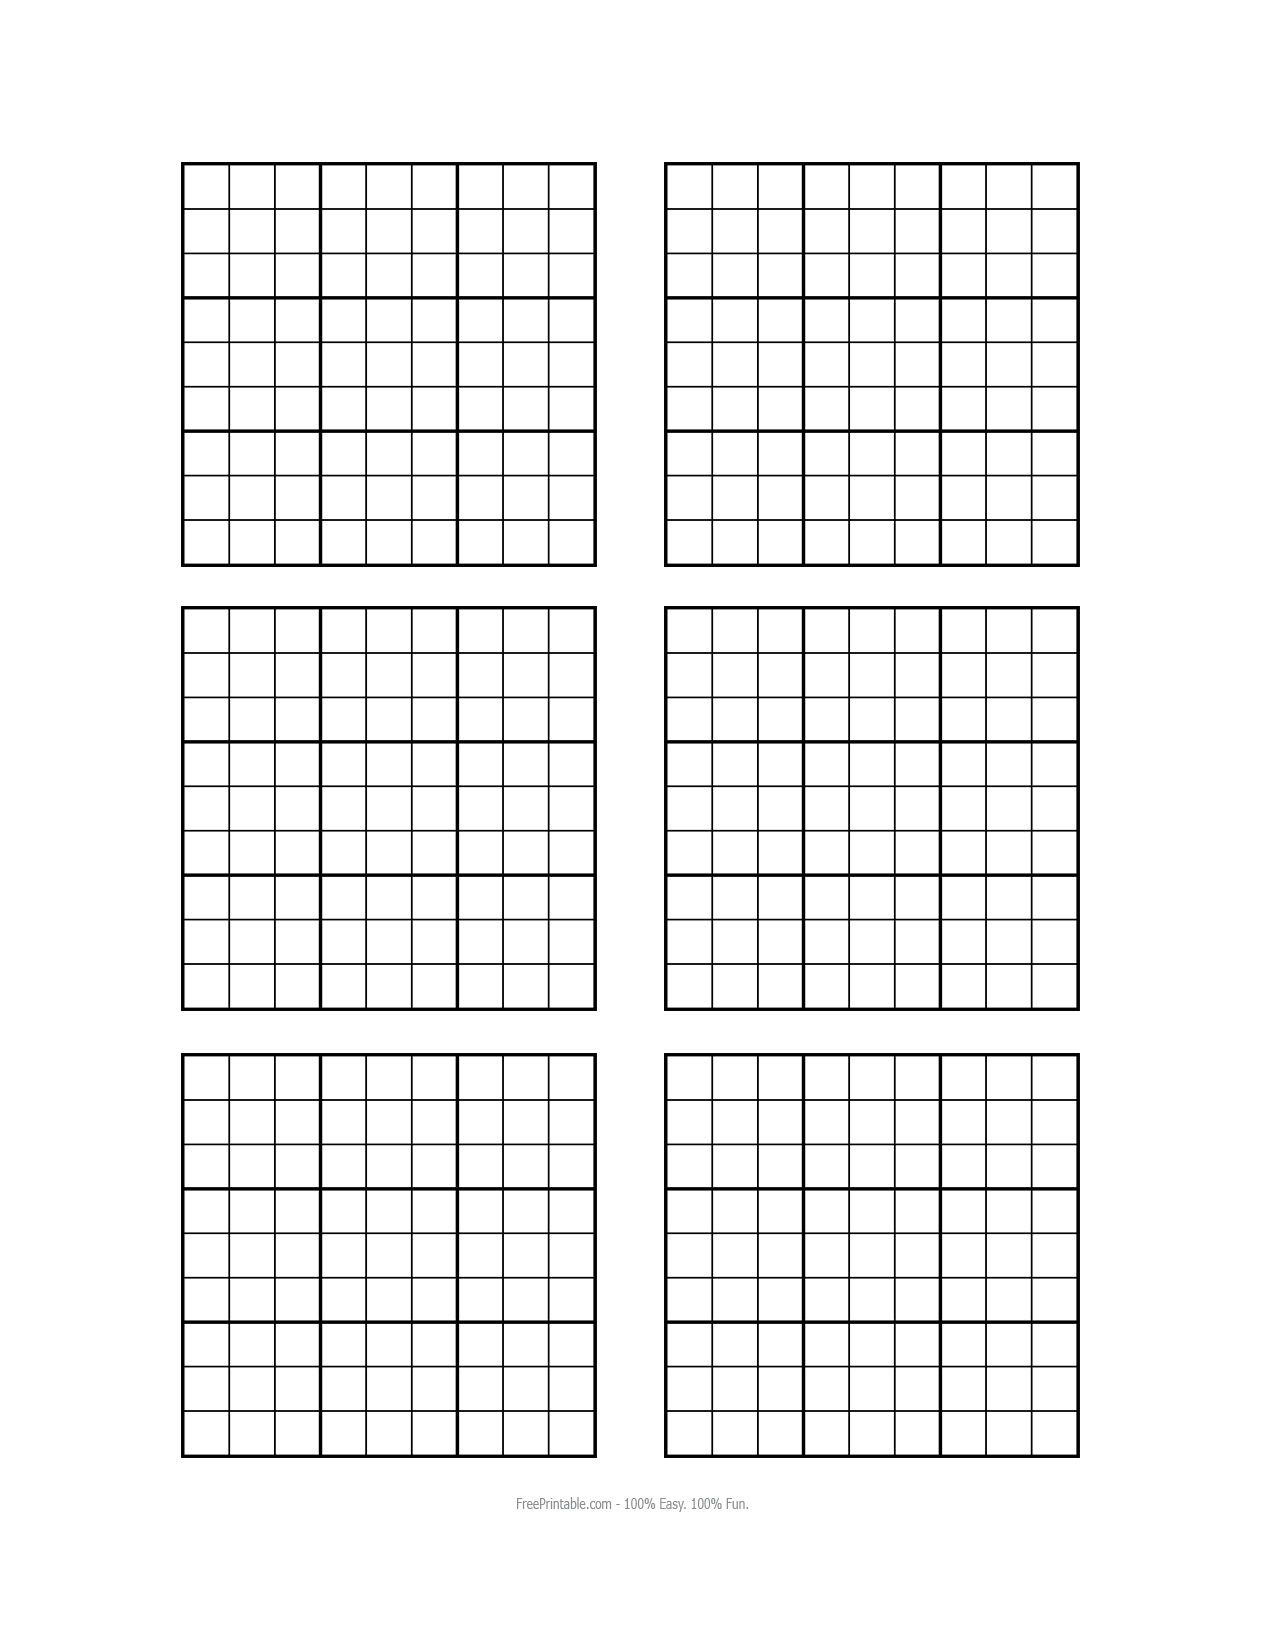 Free Printable Blank Sudoku Grids   Sudoku Printable, Grid